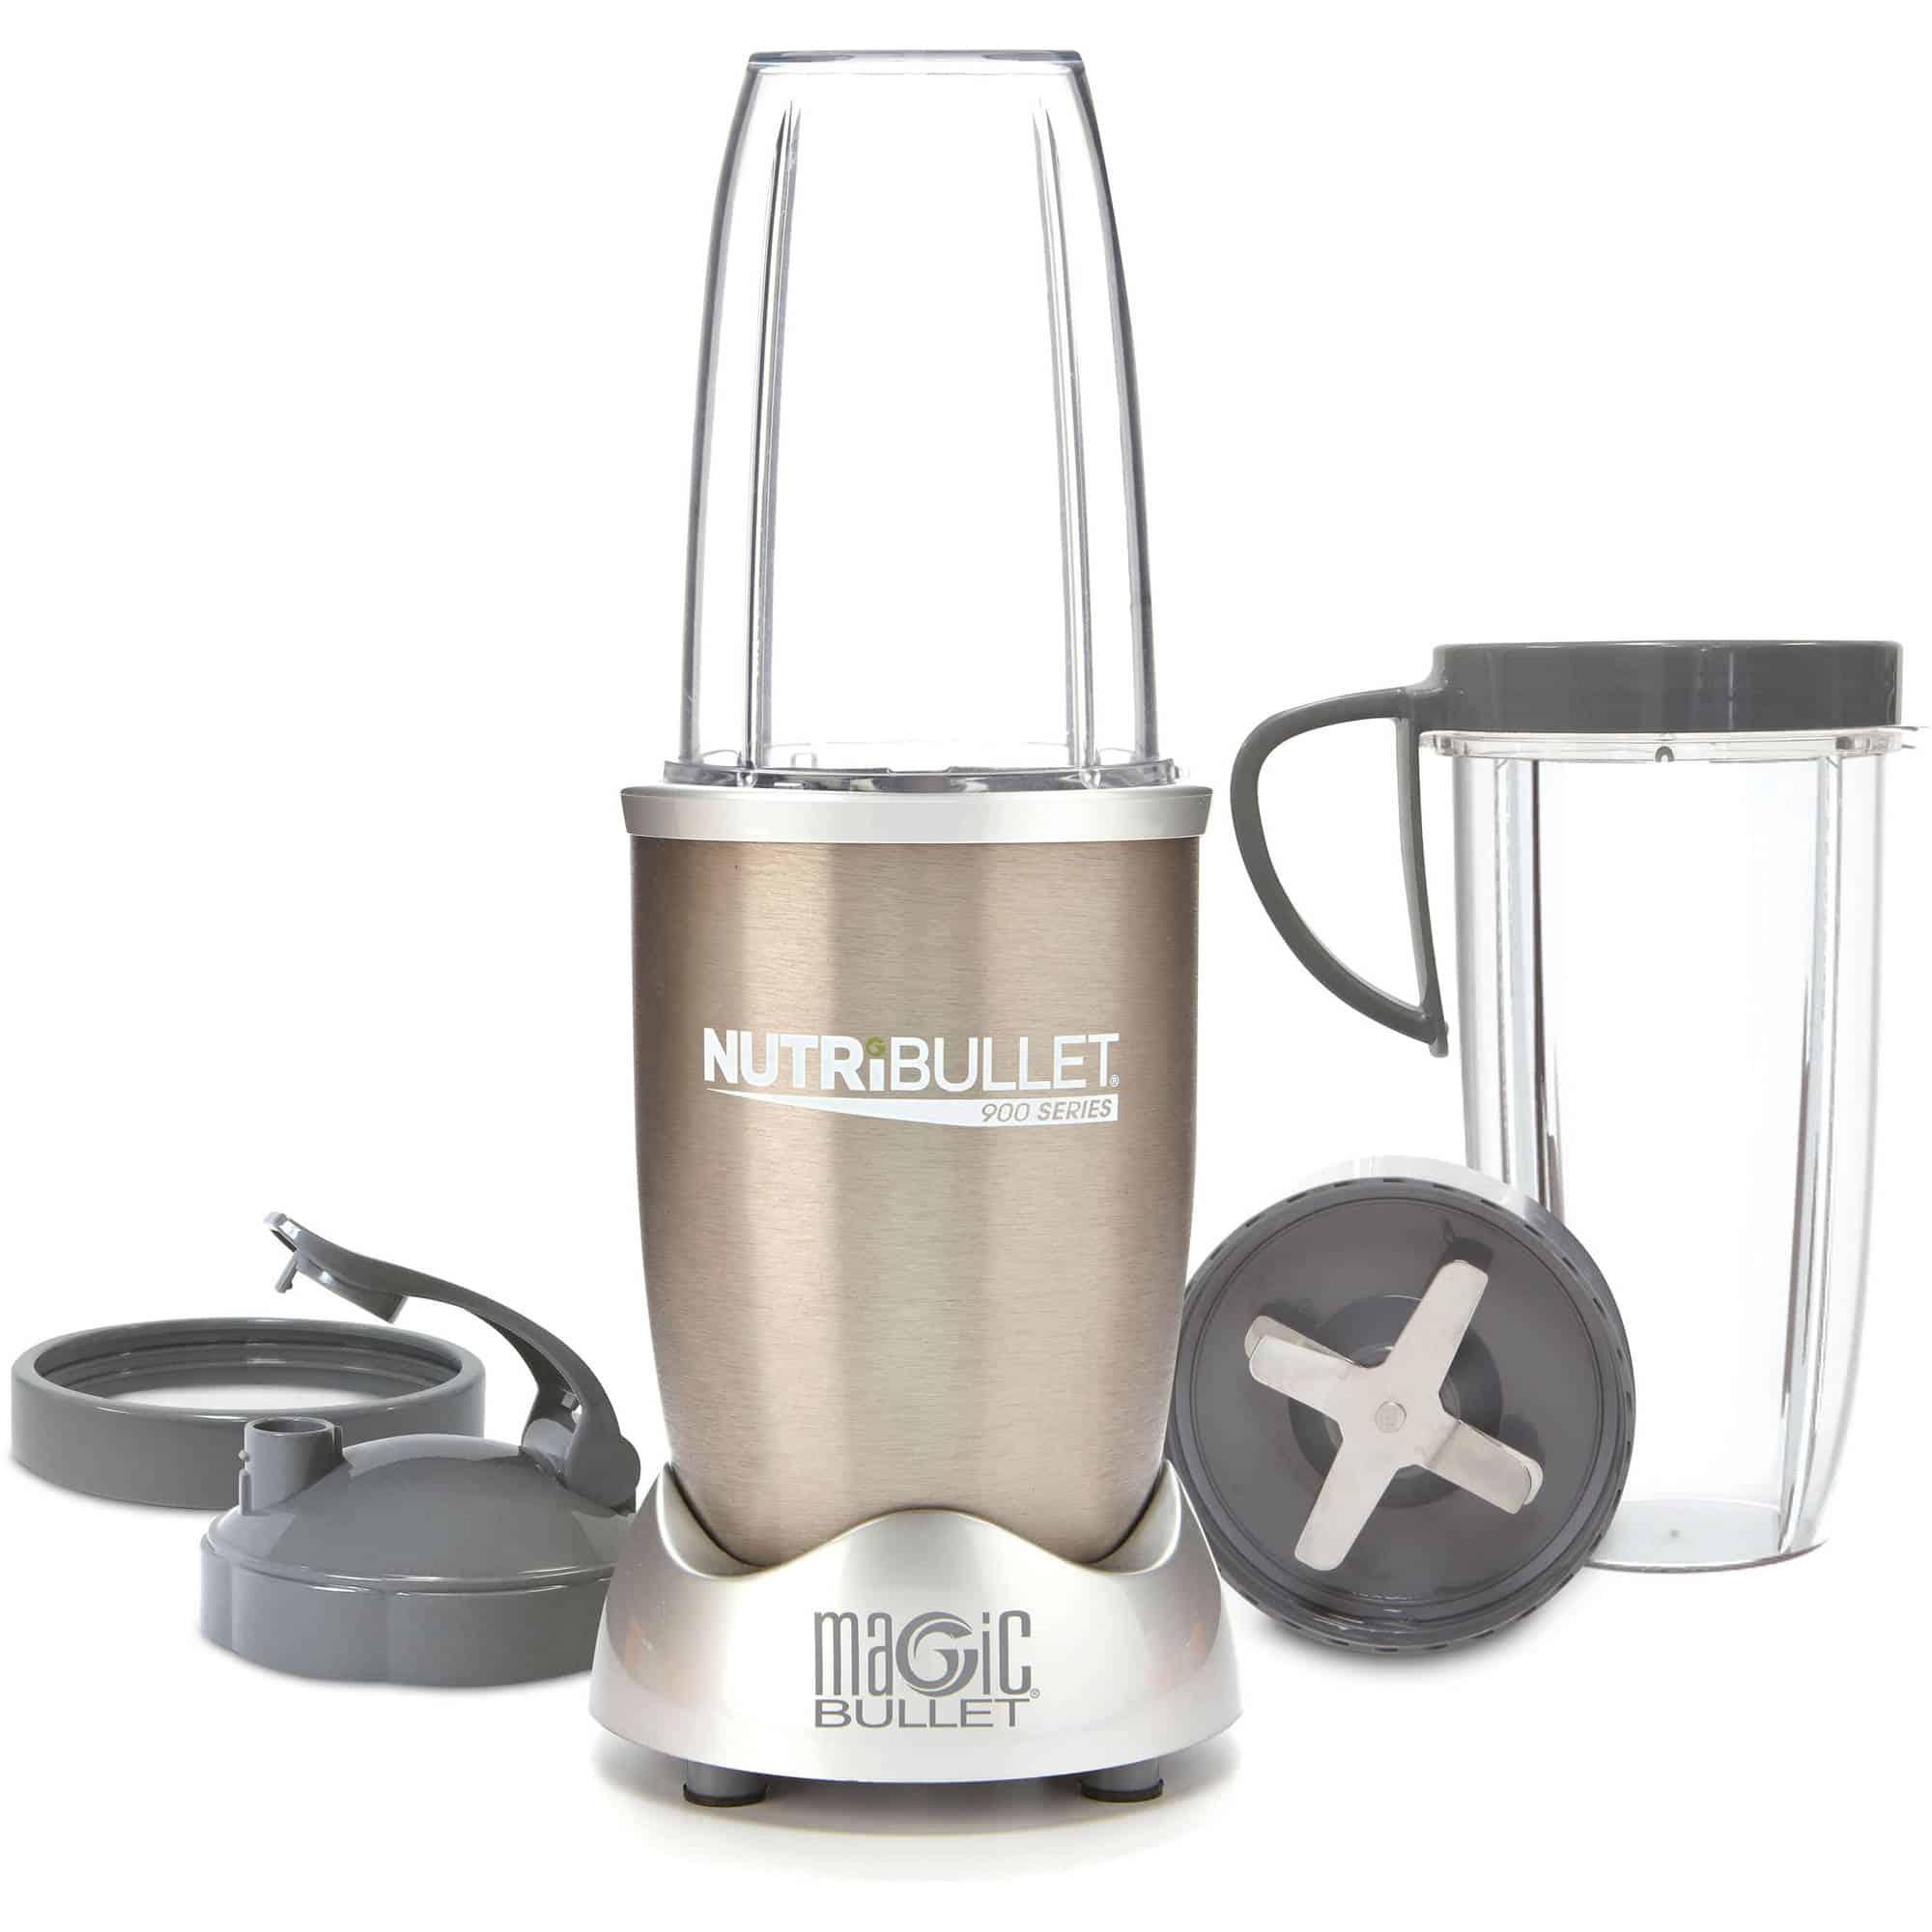 NutriBullet Pro 900 Series Blender, 9 Piece $54 {Reg $129}